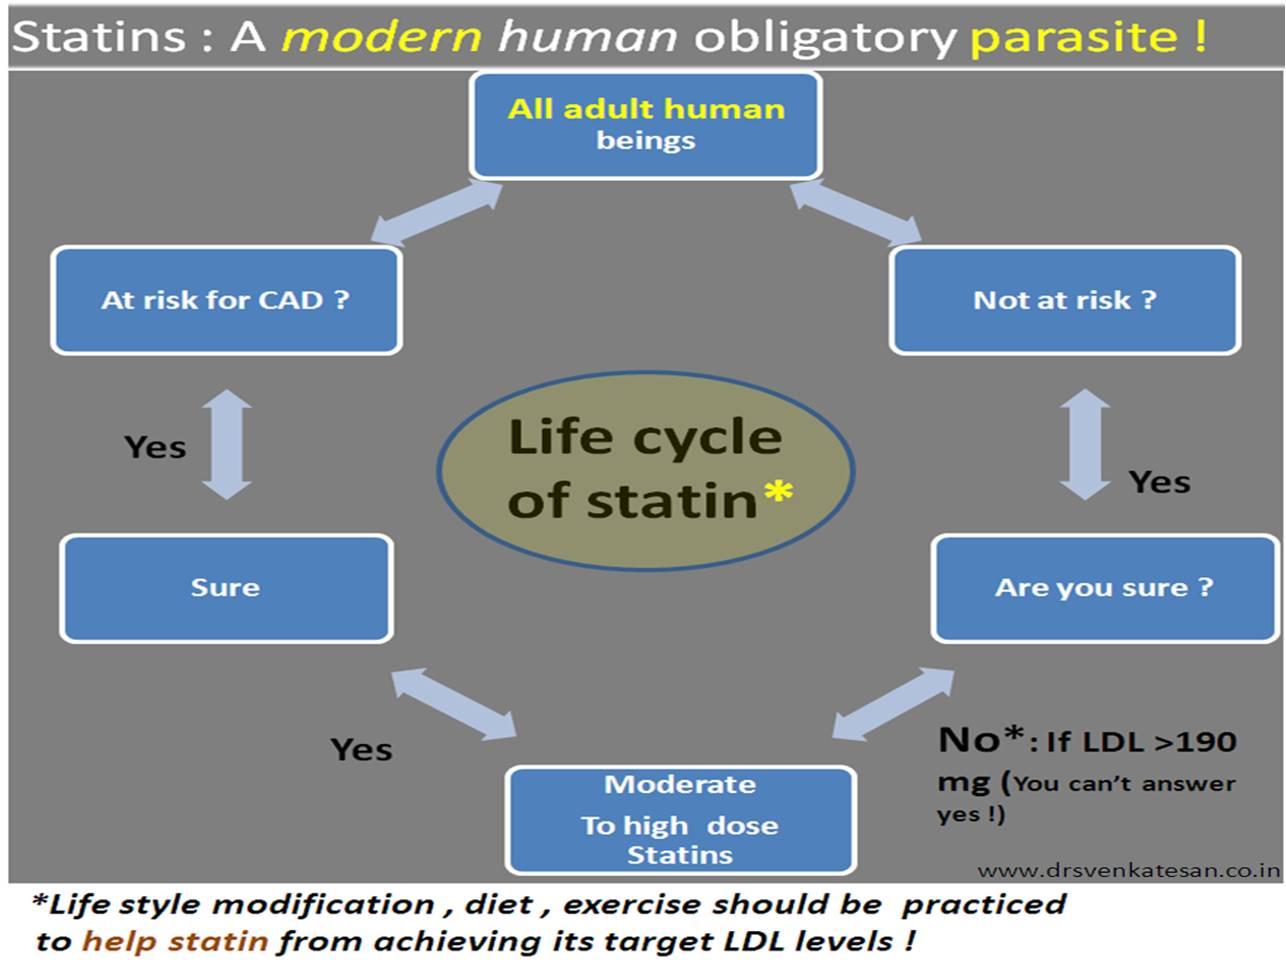 Acc Aha Lipid Cholesterol Guidelines 2013 Dr S Venkatesan Md